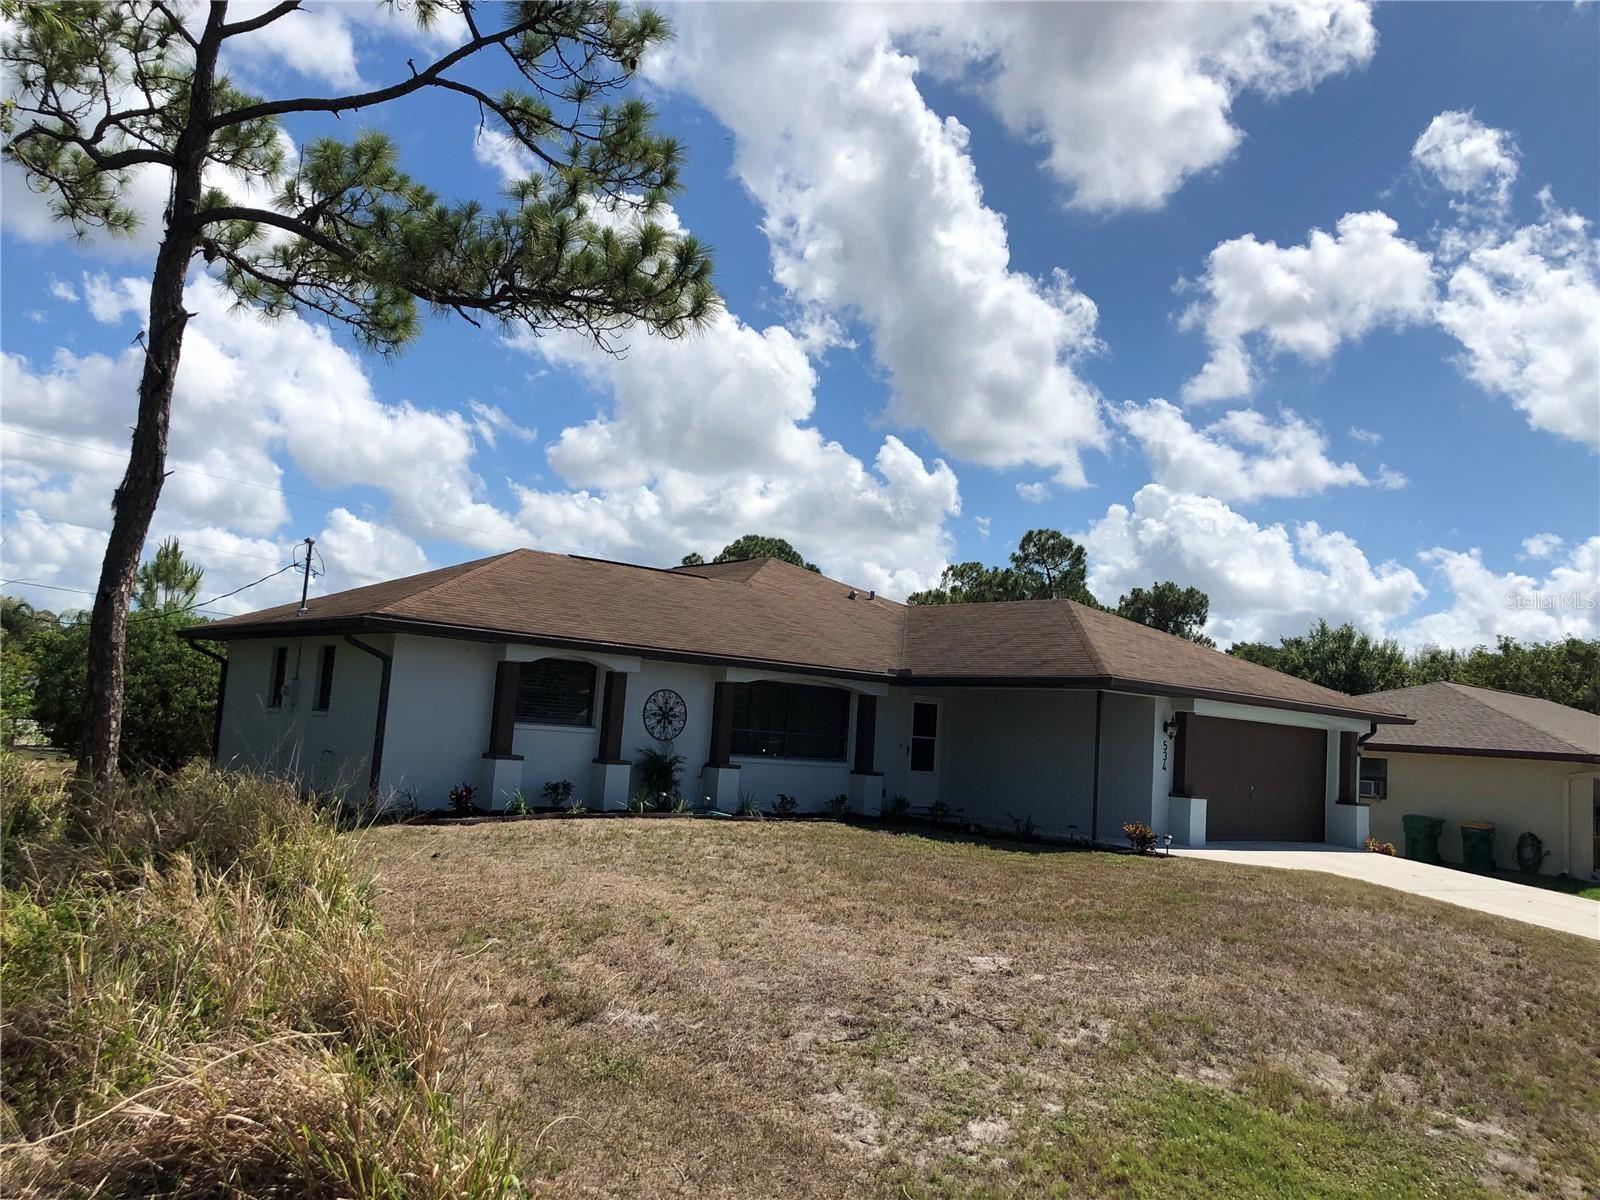 Photo of 534 FAIRVIEW AVENUE NW, PORT CHARLOTTE, FL 33952 (MLS # C7444694)